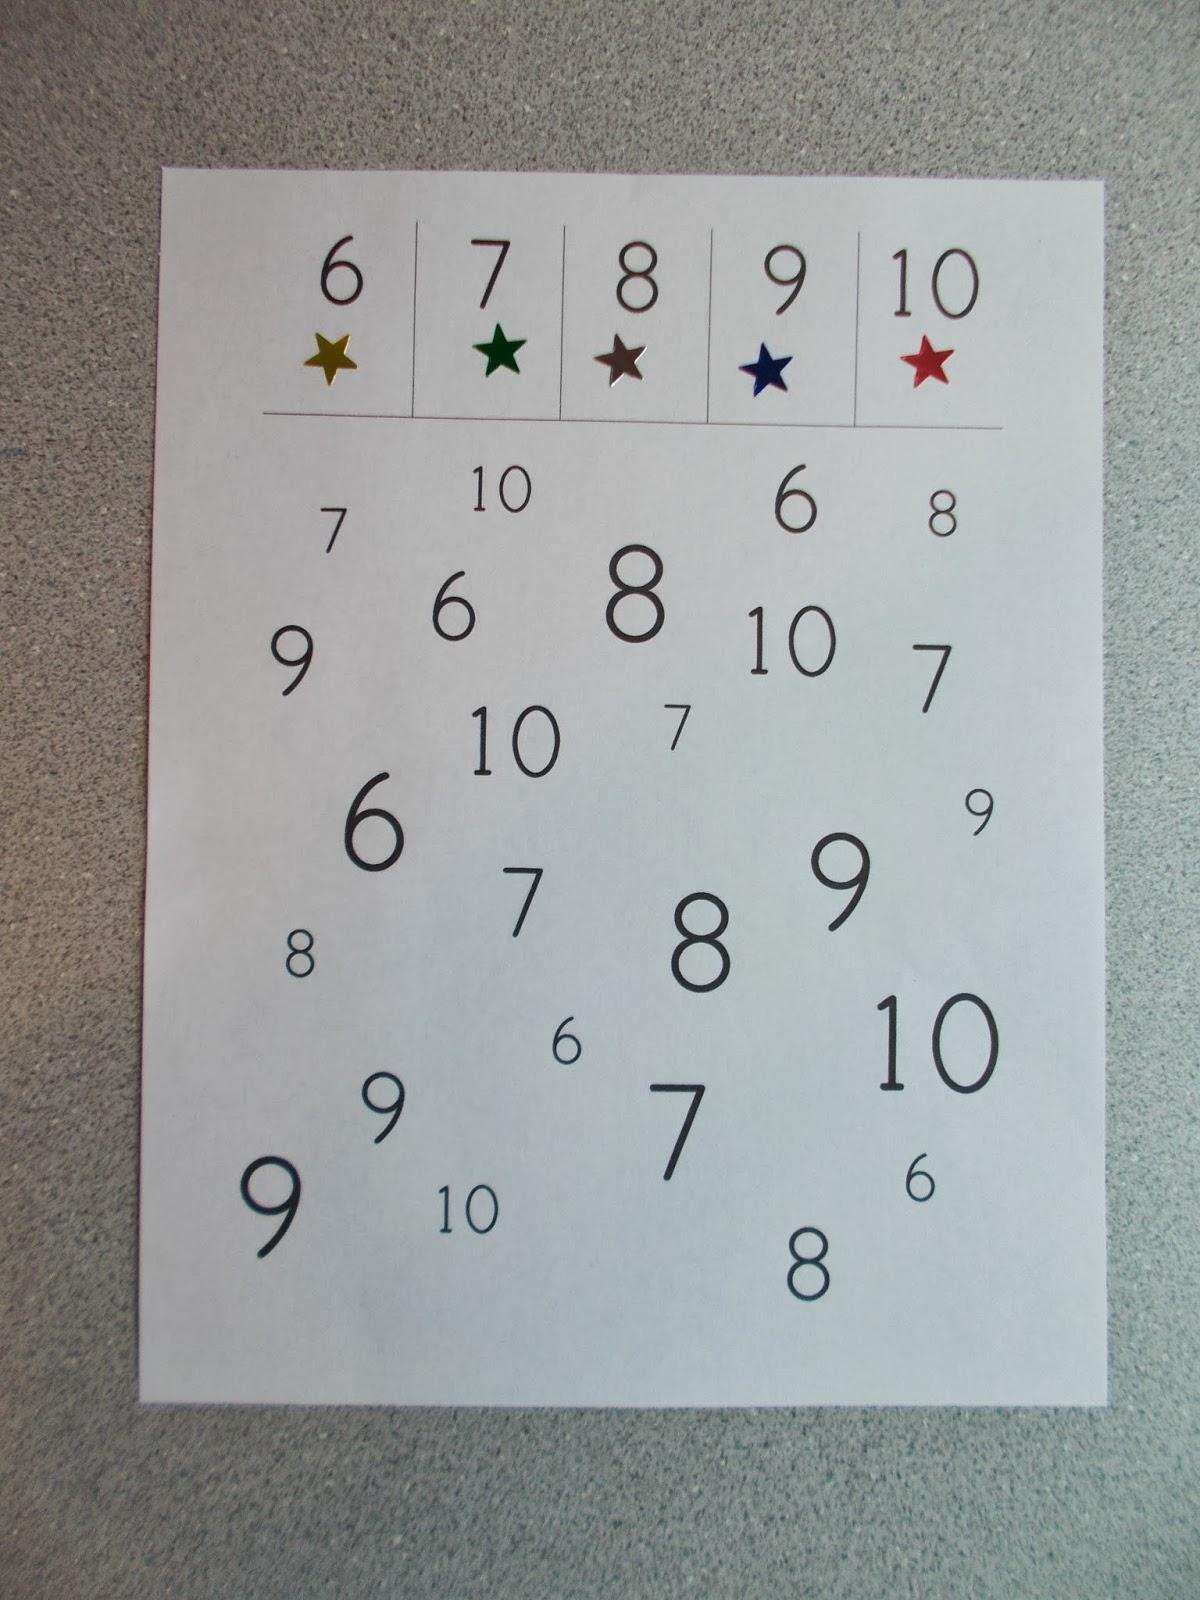 Chipman S Corner Preschool Number Search